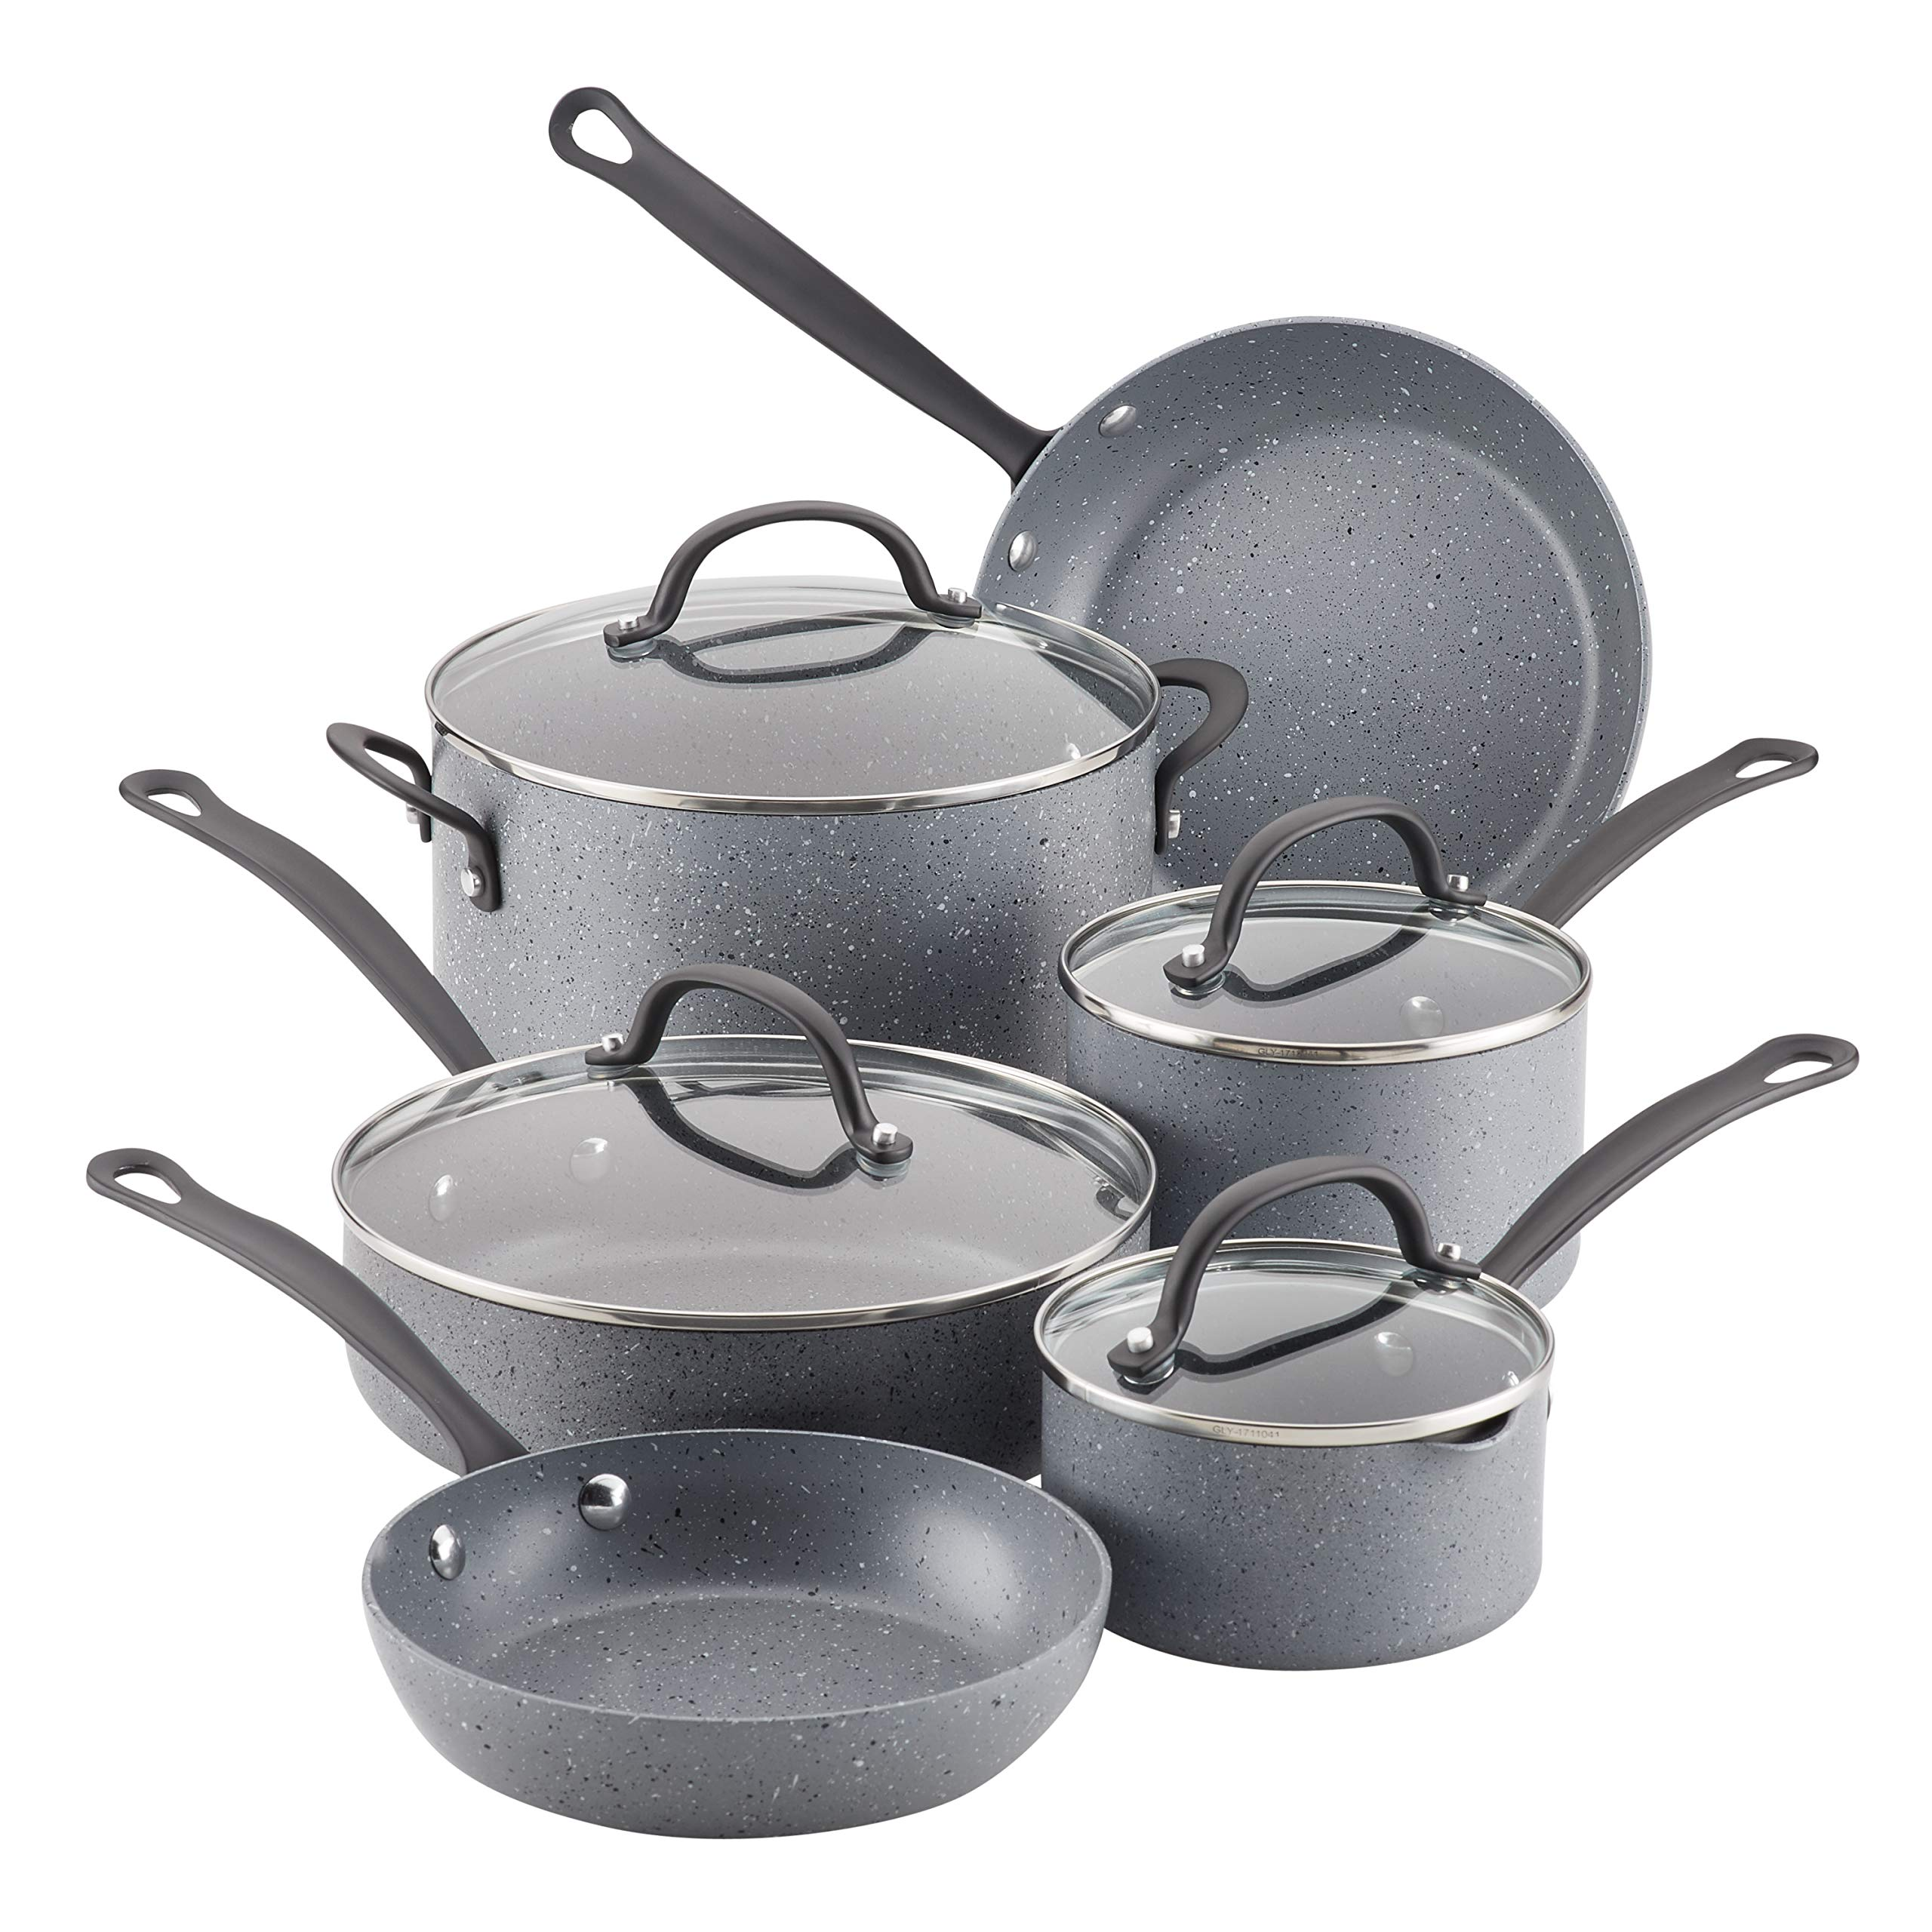 Farberware 10594 10-Piece Aluminum Cookware Set, Gray Speckle by Farberware (Image #1)